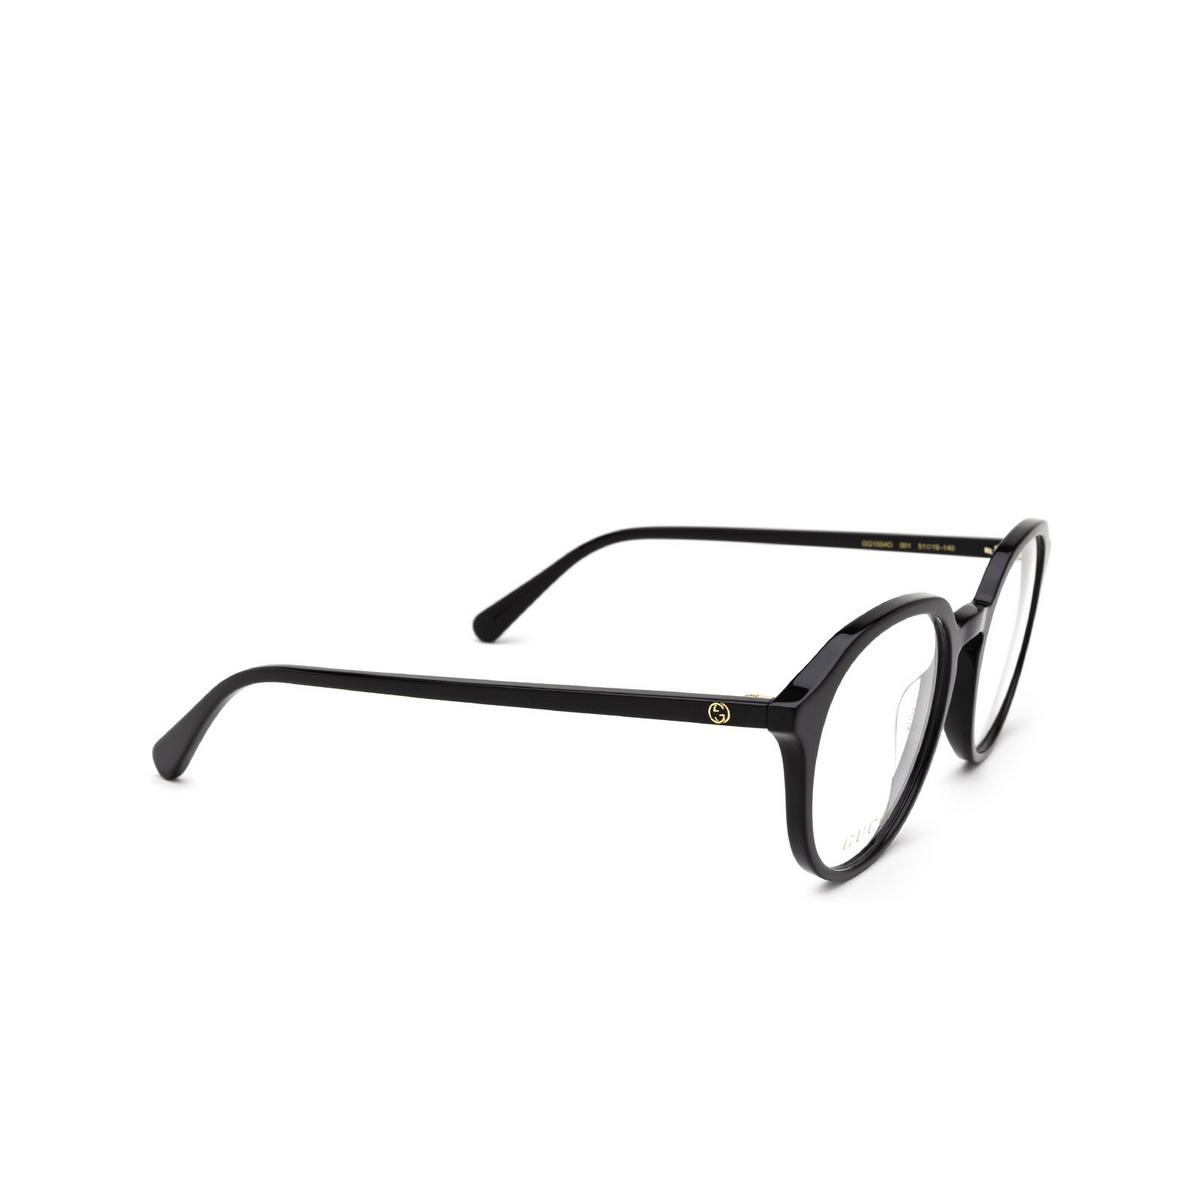 Gucci® Round Eyeglasses: GG1004O color Black 001 - three-quarters view.